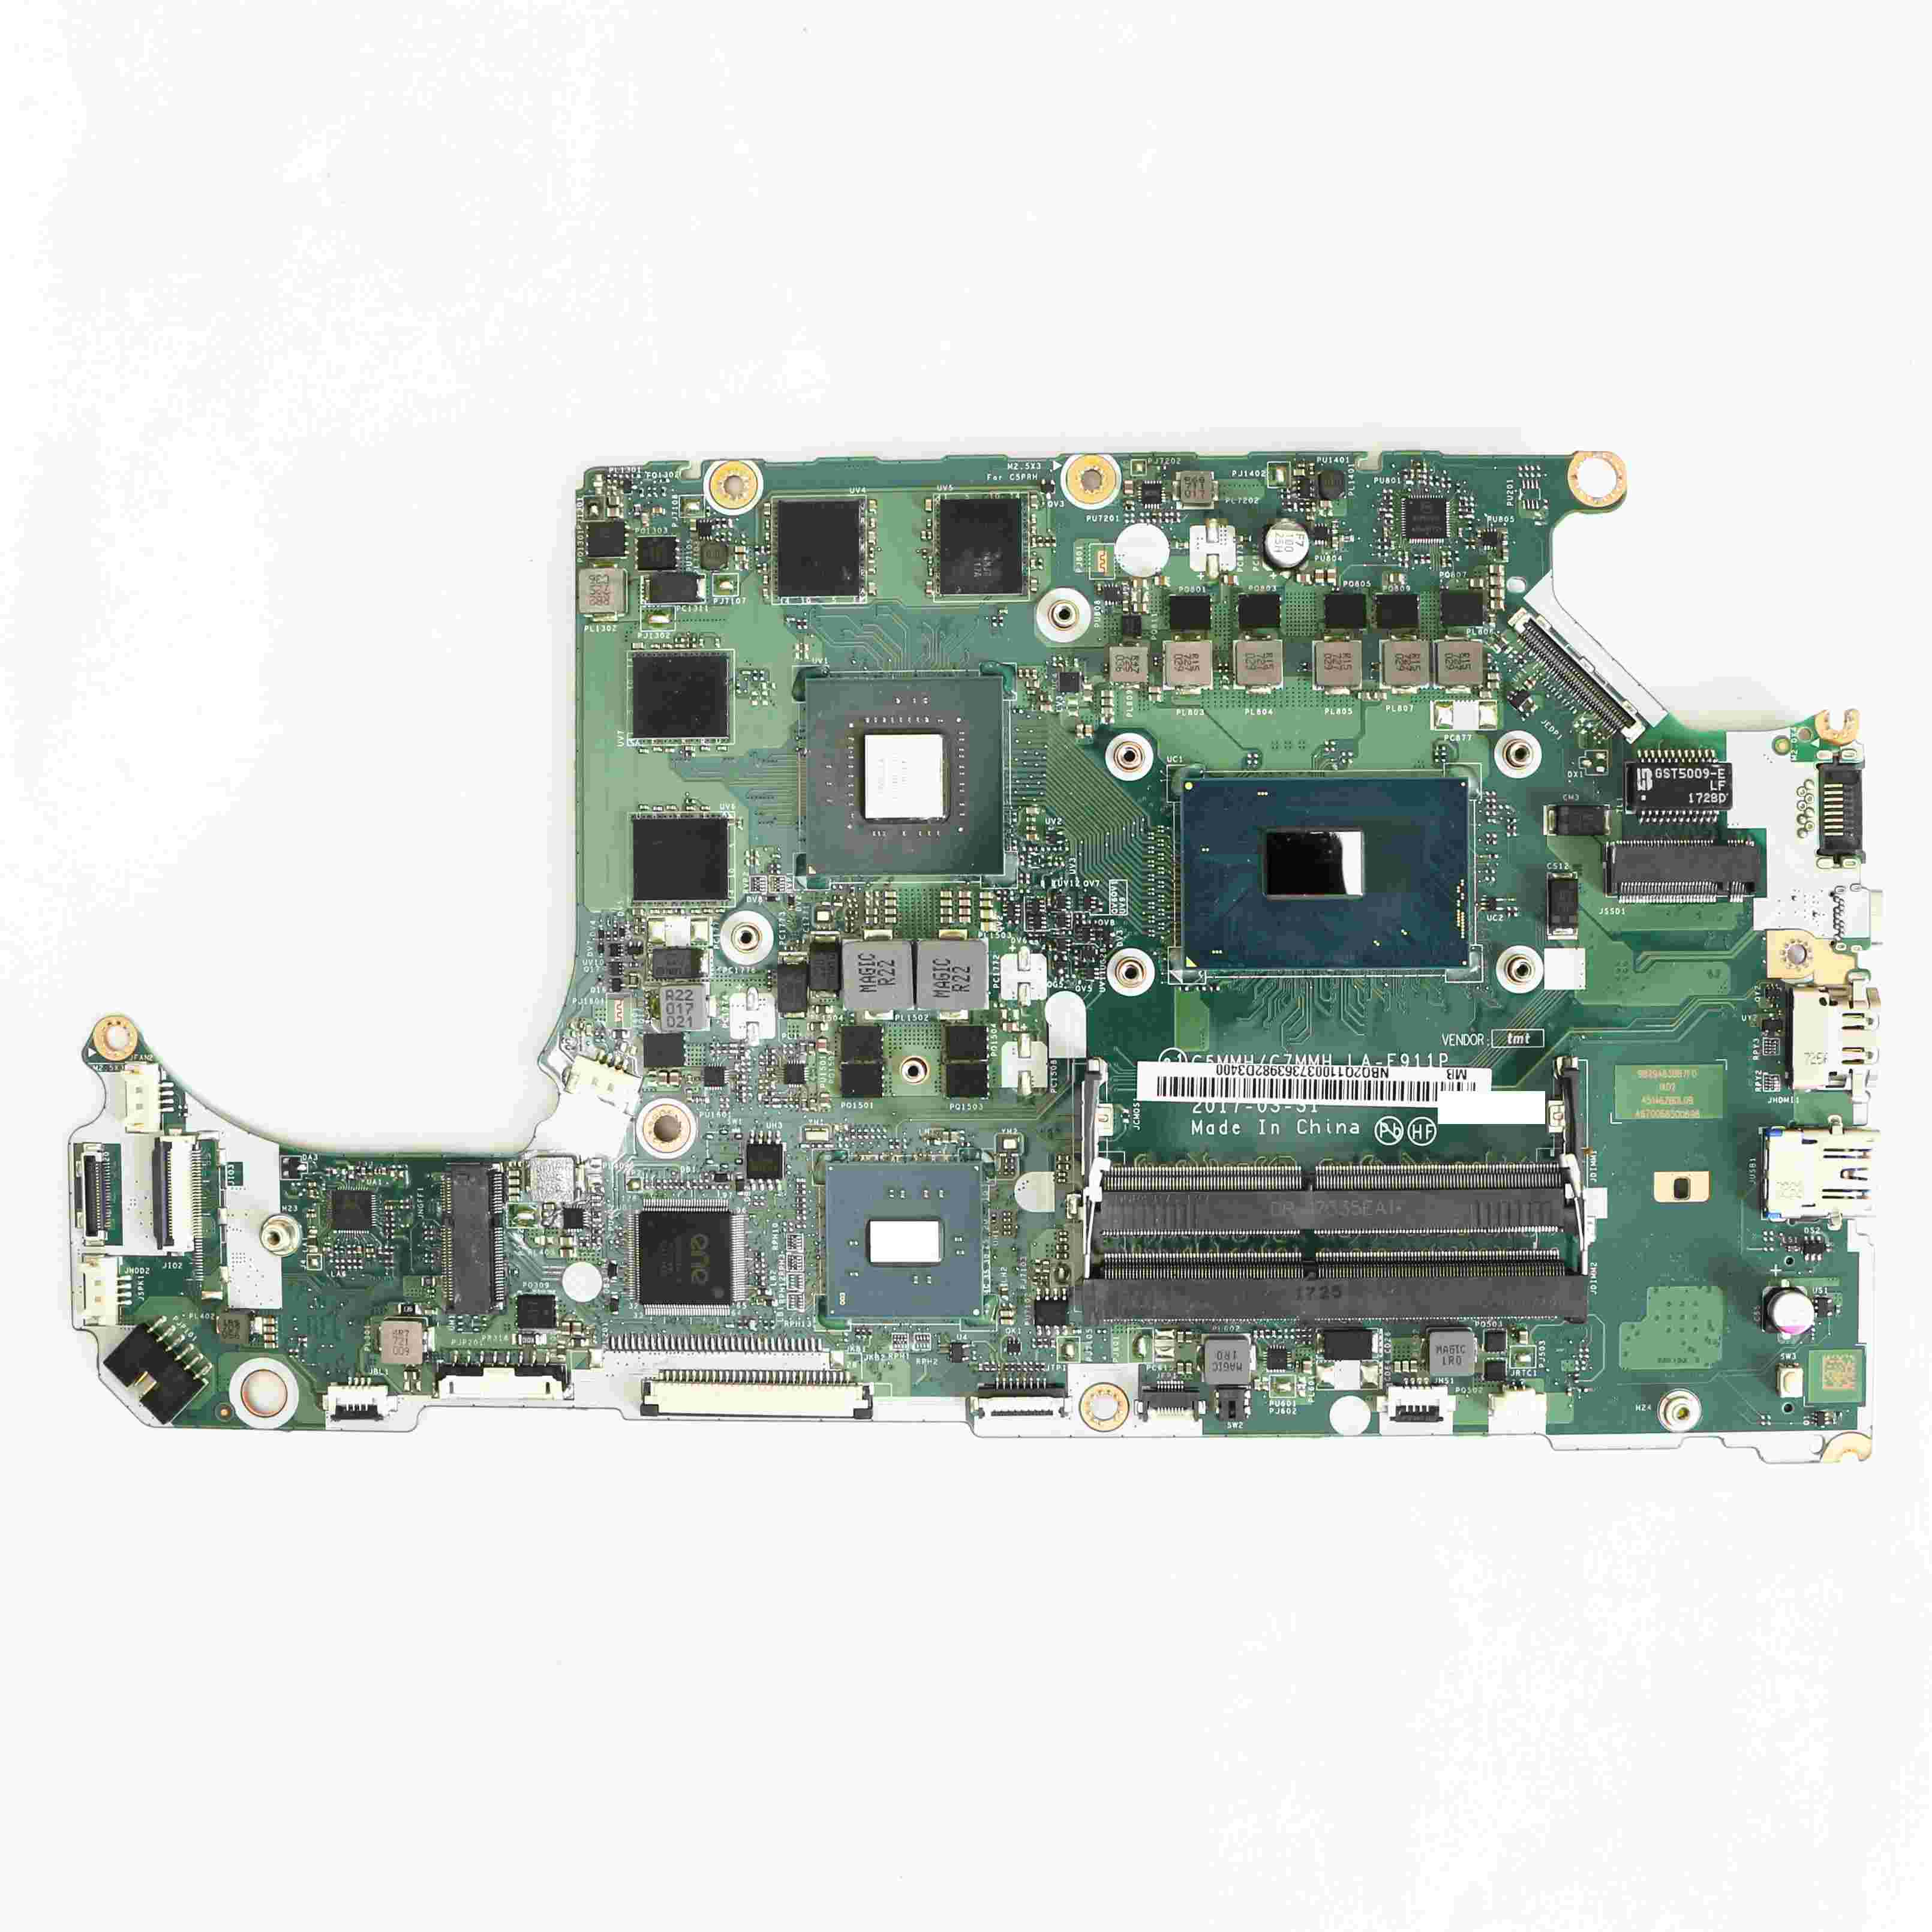 NB.Q2Q11.003 NBQ2Q11003 Laptop DDR4 Motherboard C5MMH / C7MMH LA-E911P w/ i5-7300HQ & GTX1050 V4G for Acer A715-71G Laptops